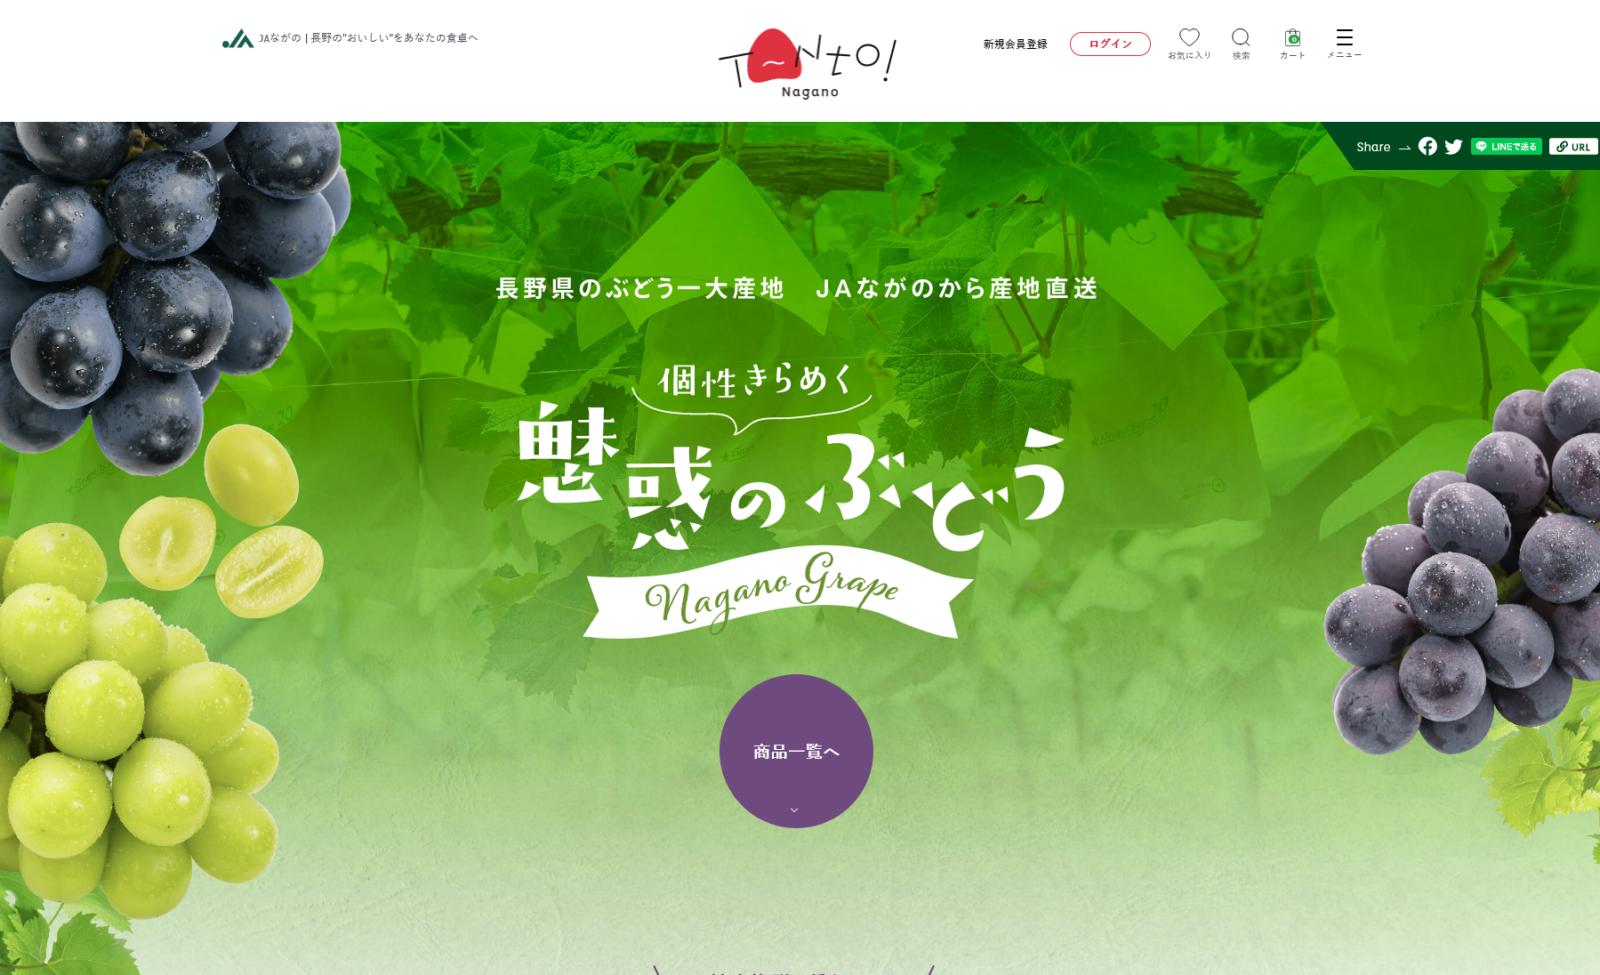 JA「たーんとながの」ぶどうランディングページ【サイト制作】